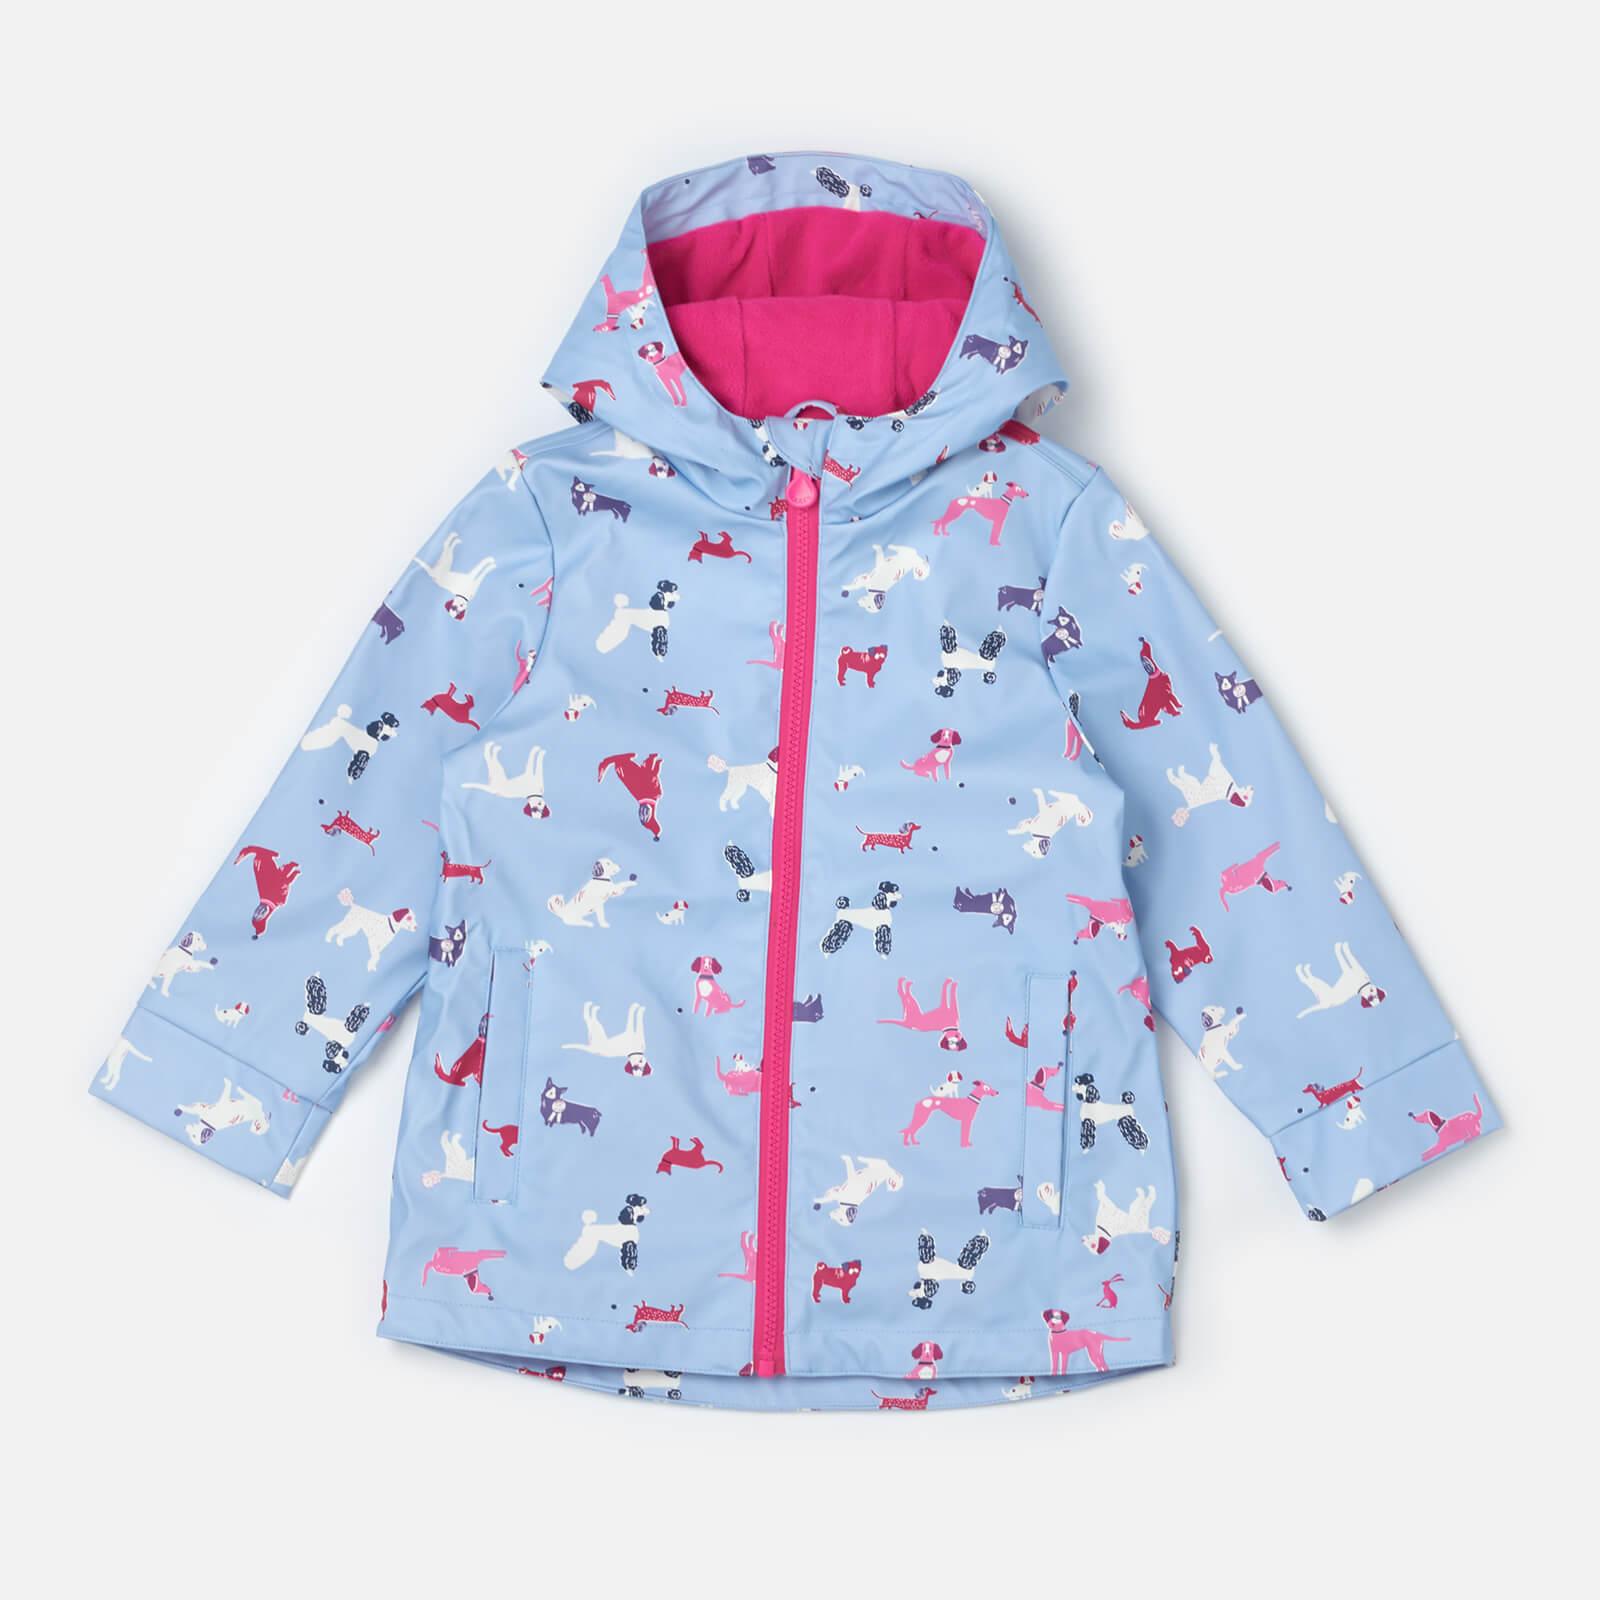 3b1b999a7 Joules Girls' Raindance Waterproof Coat - Sky Blue Dog Clothing | TheHut.com